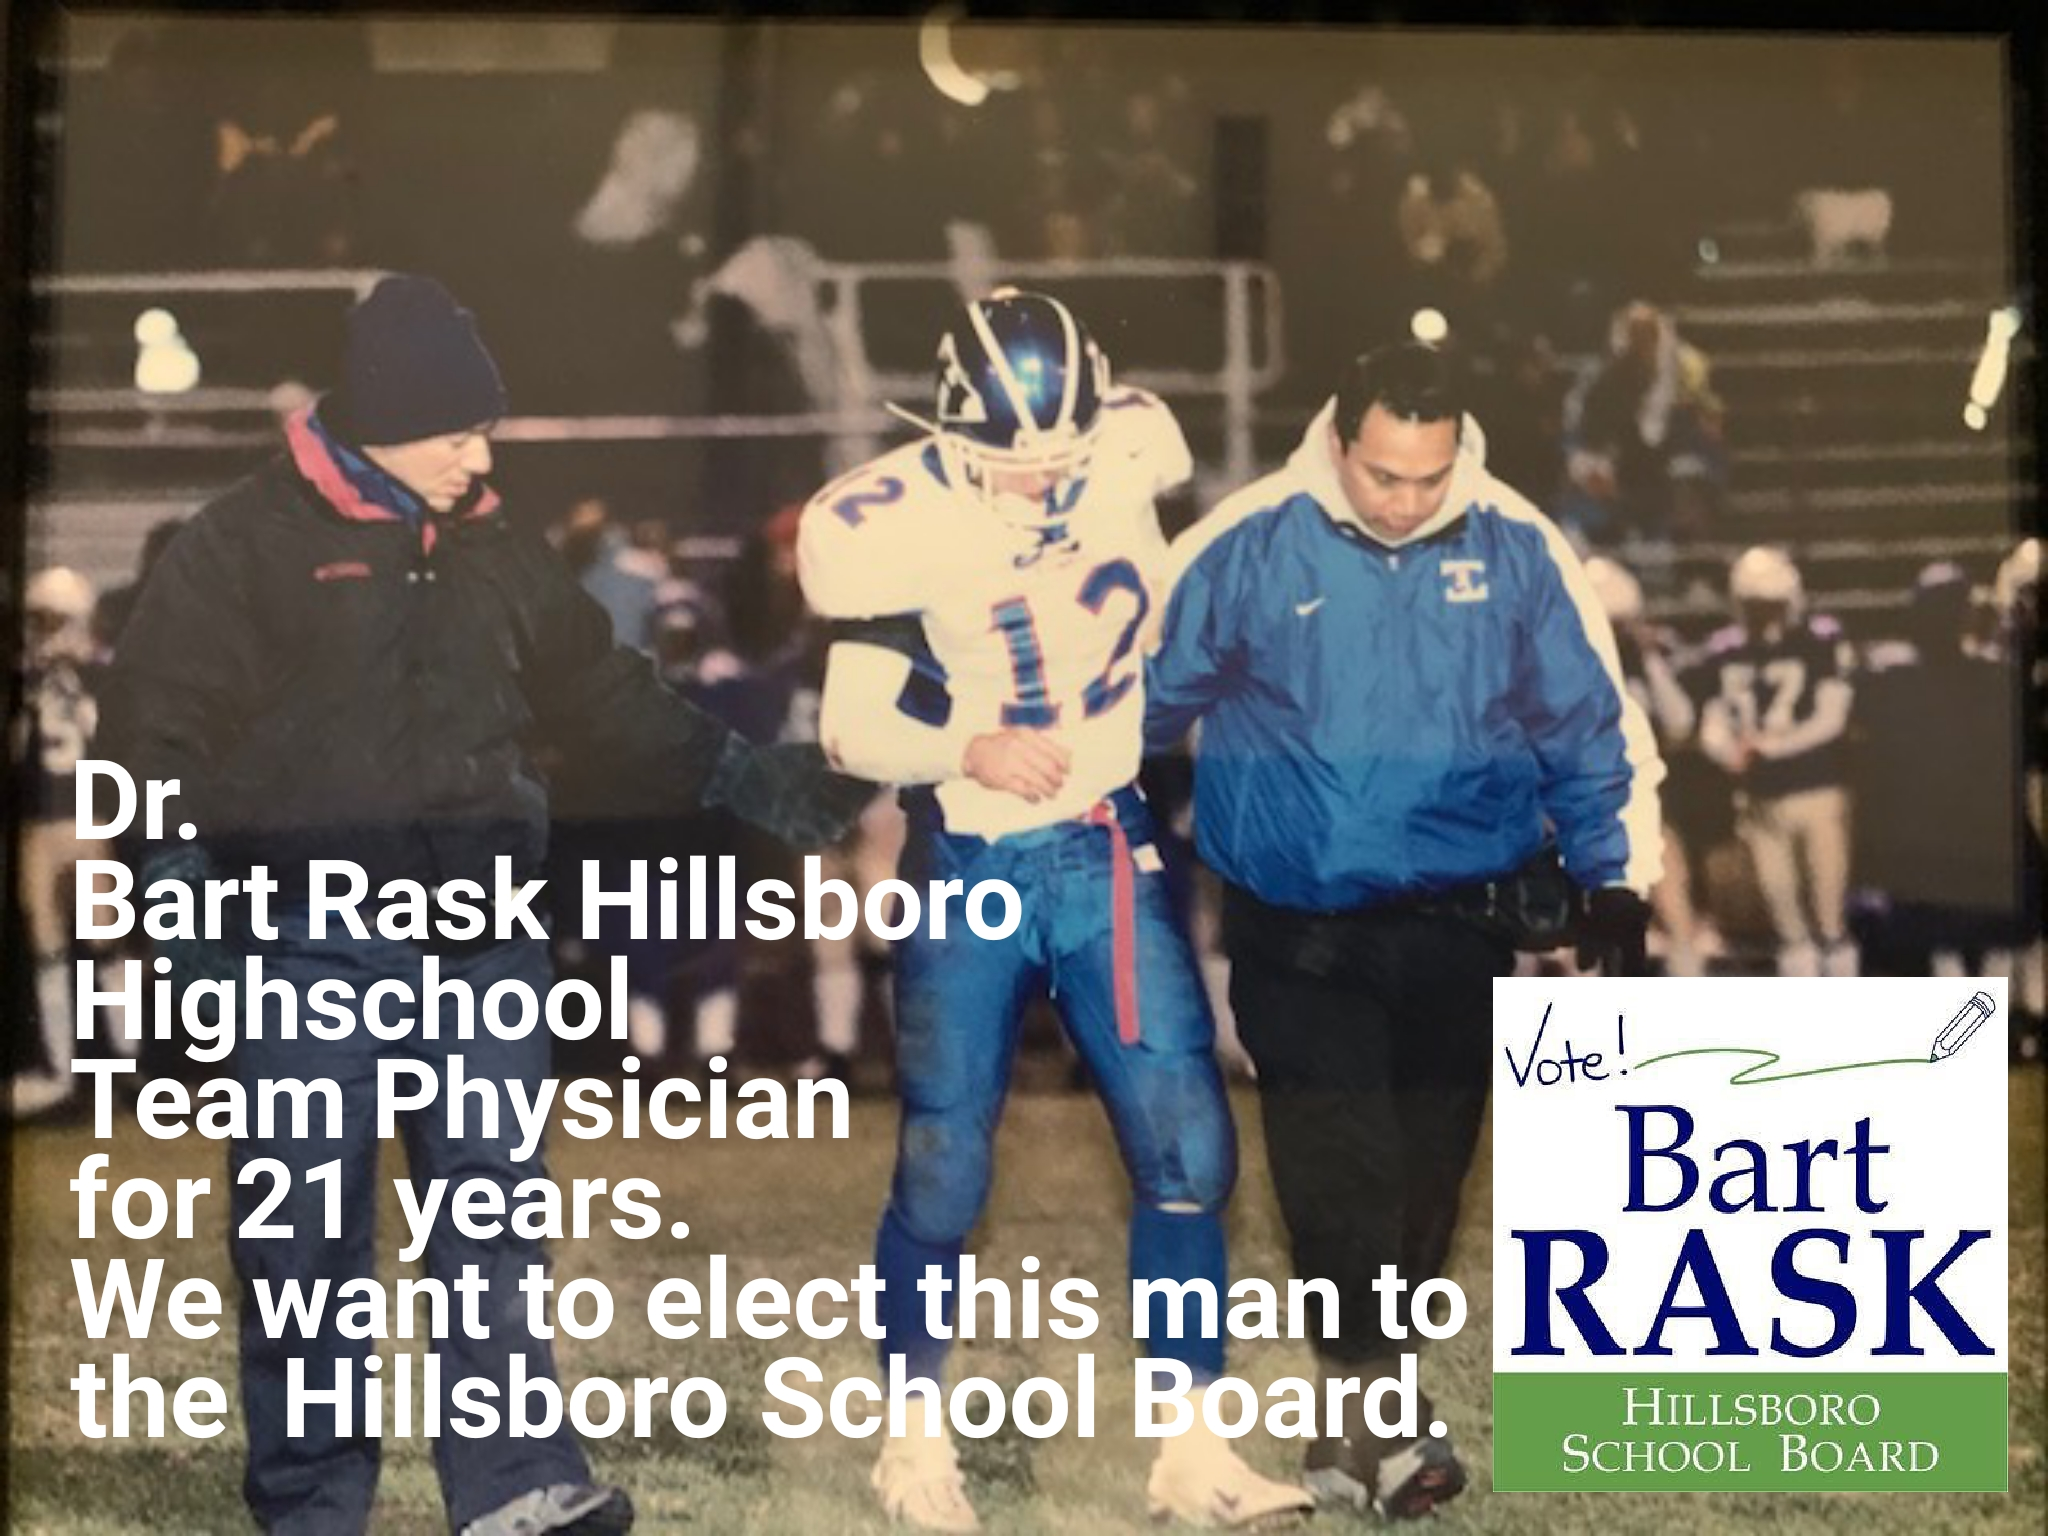 Bart Rask Hillsboro School Board